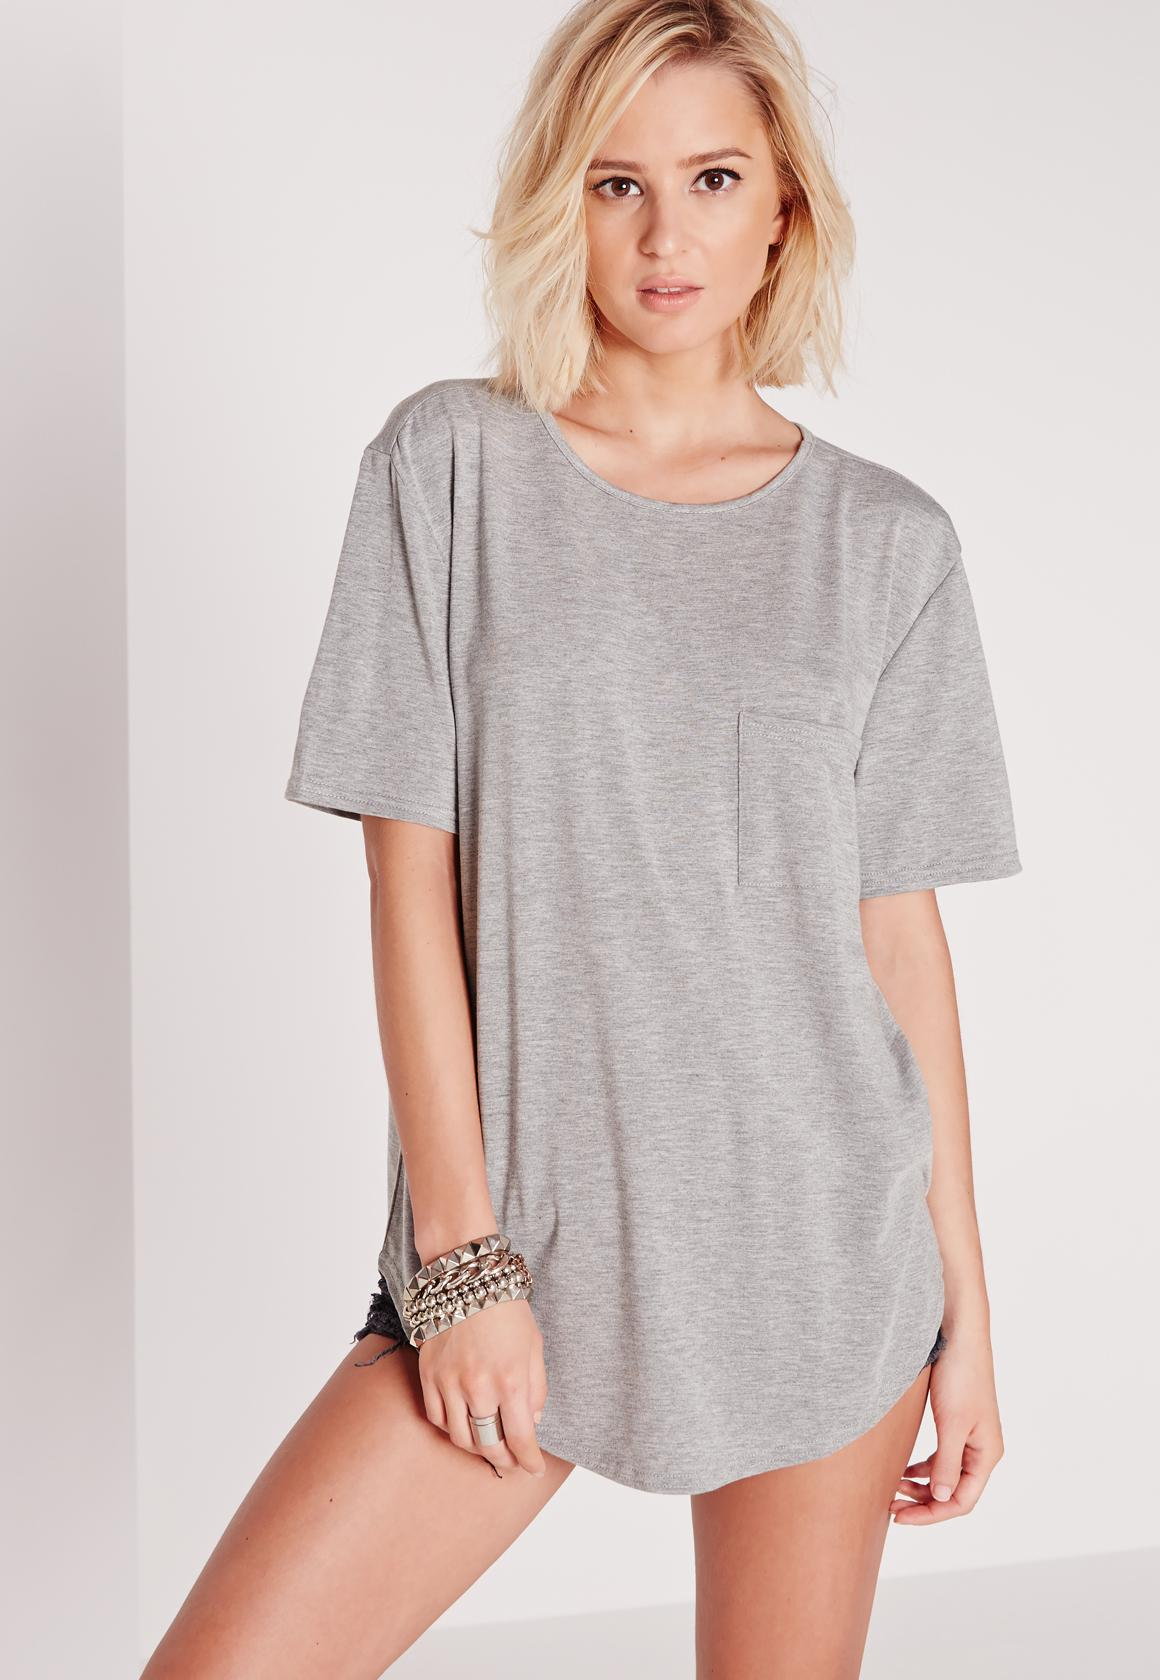 Basic One Pocket T Shirt Grey